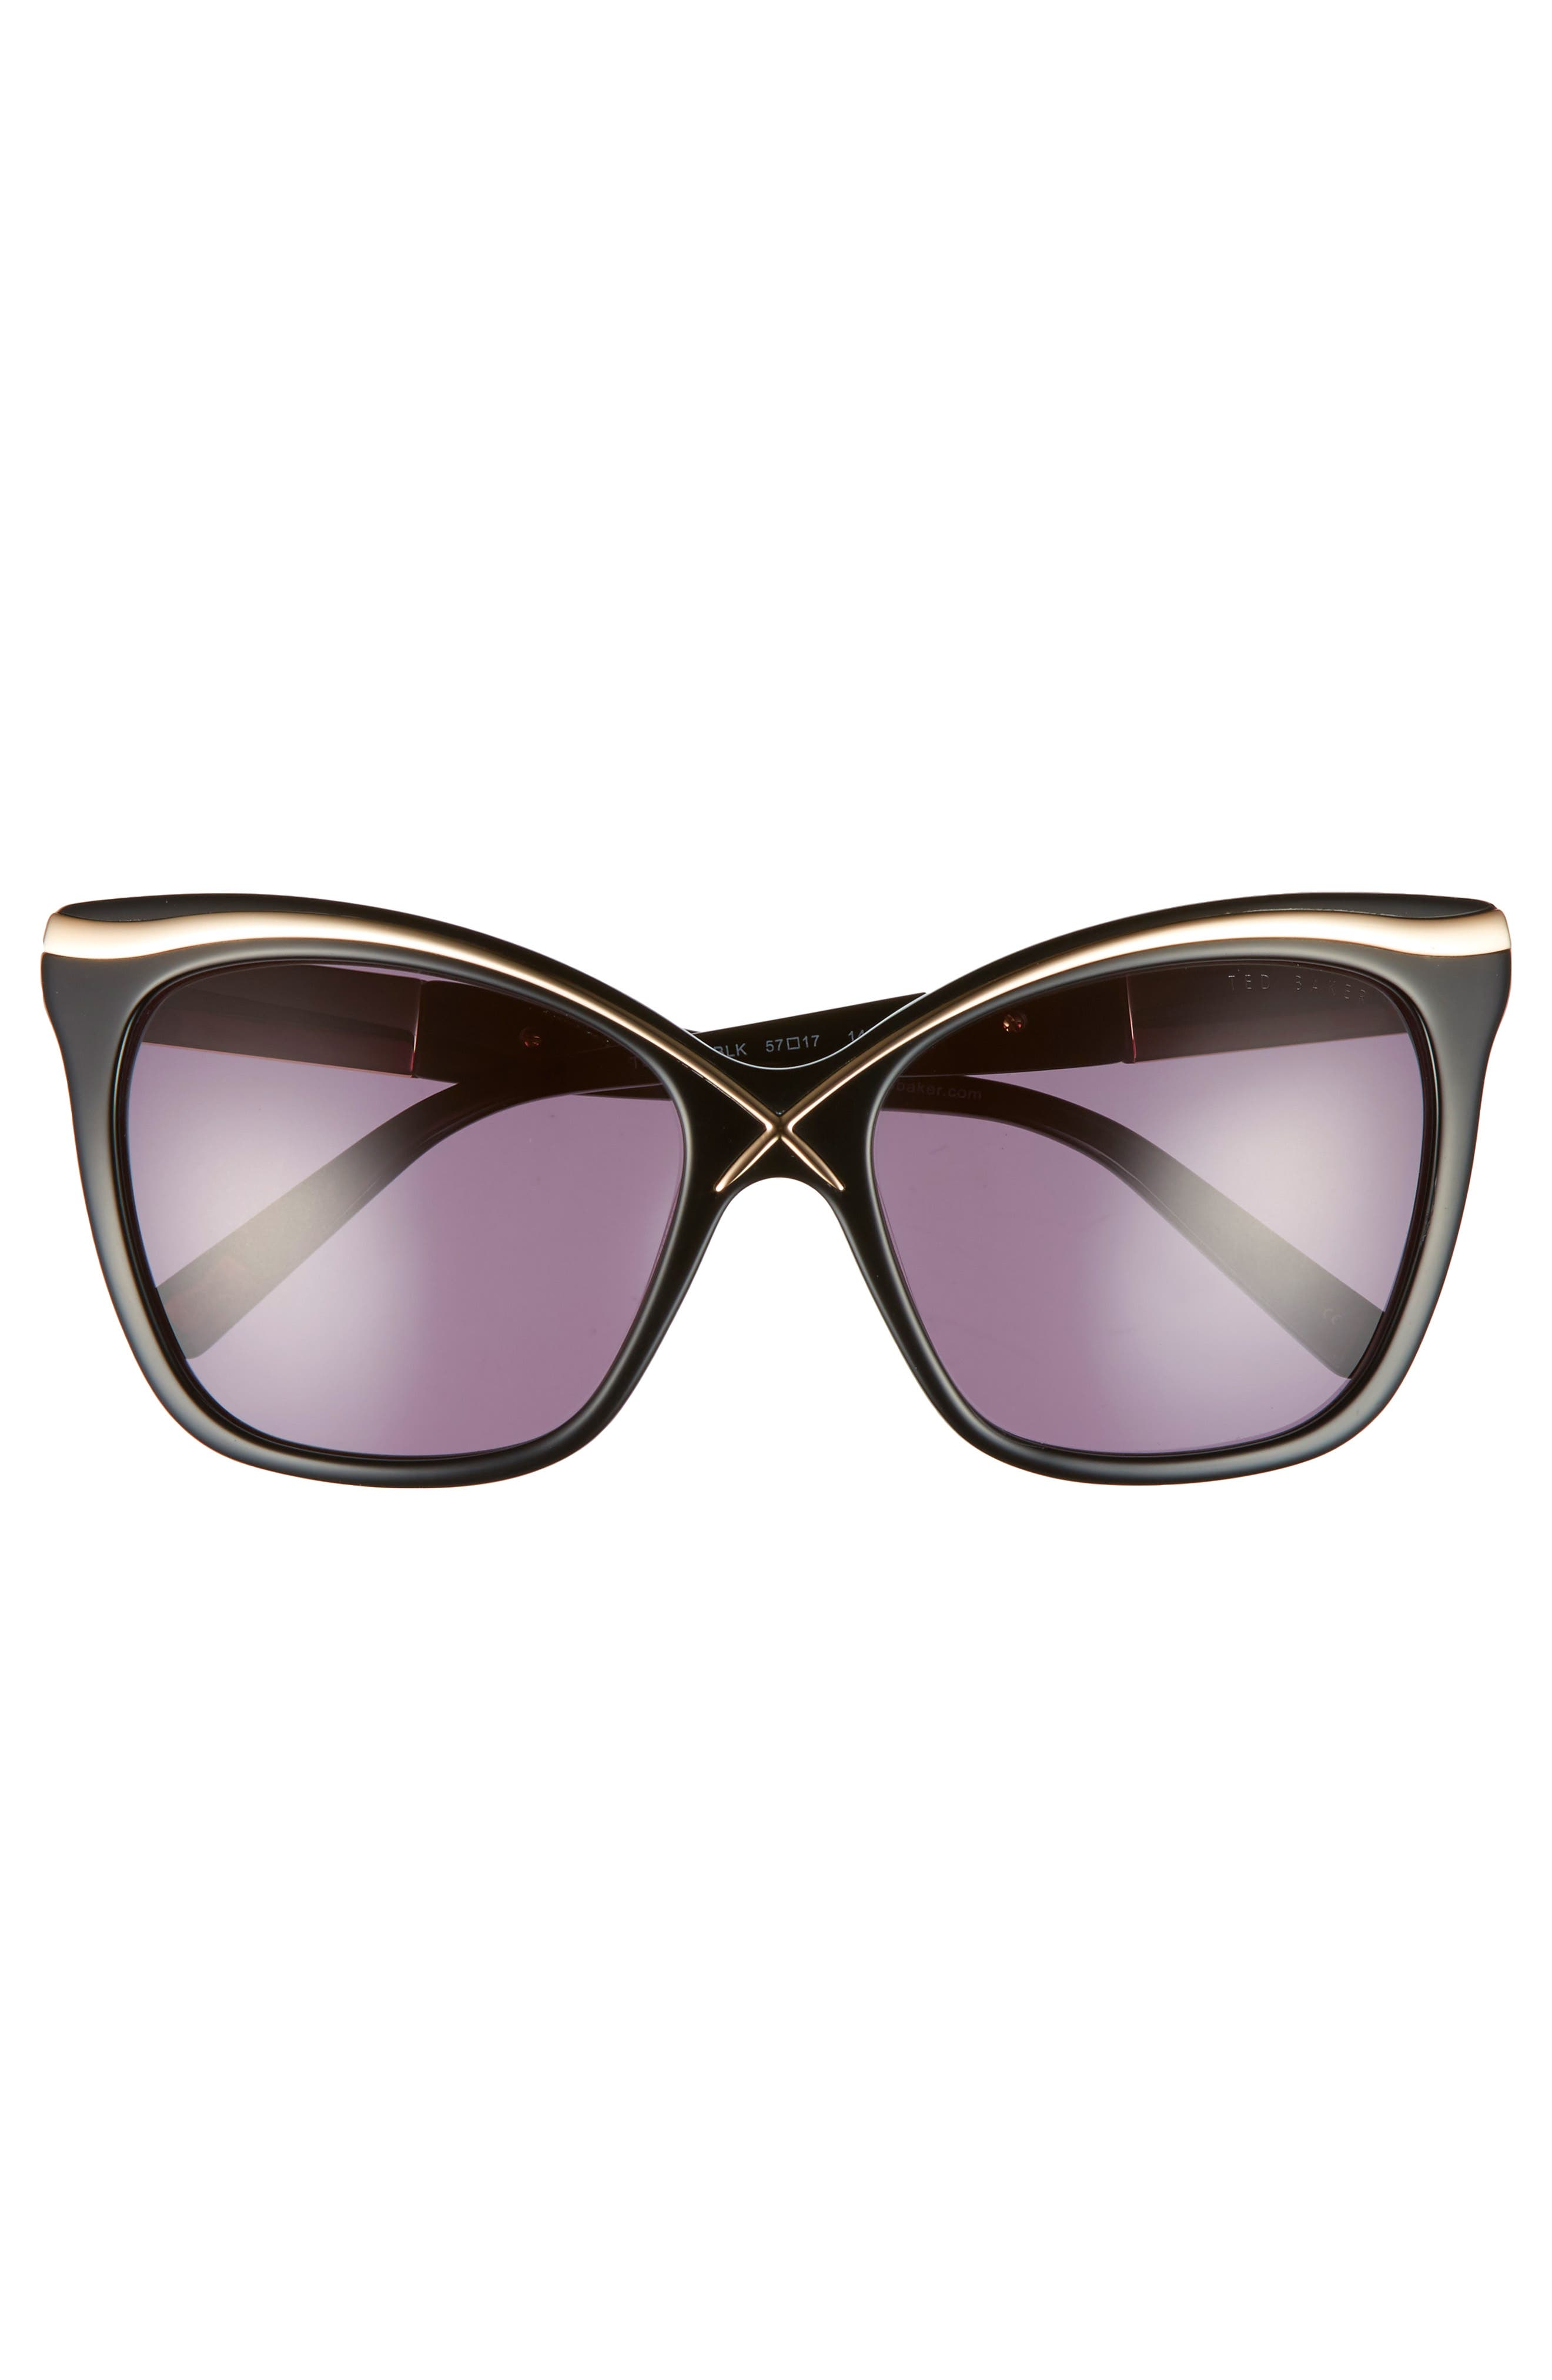 57mm Square Cat Eye Sunglasses,                             Alternate thumbnail 7, color,